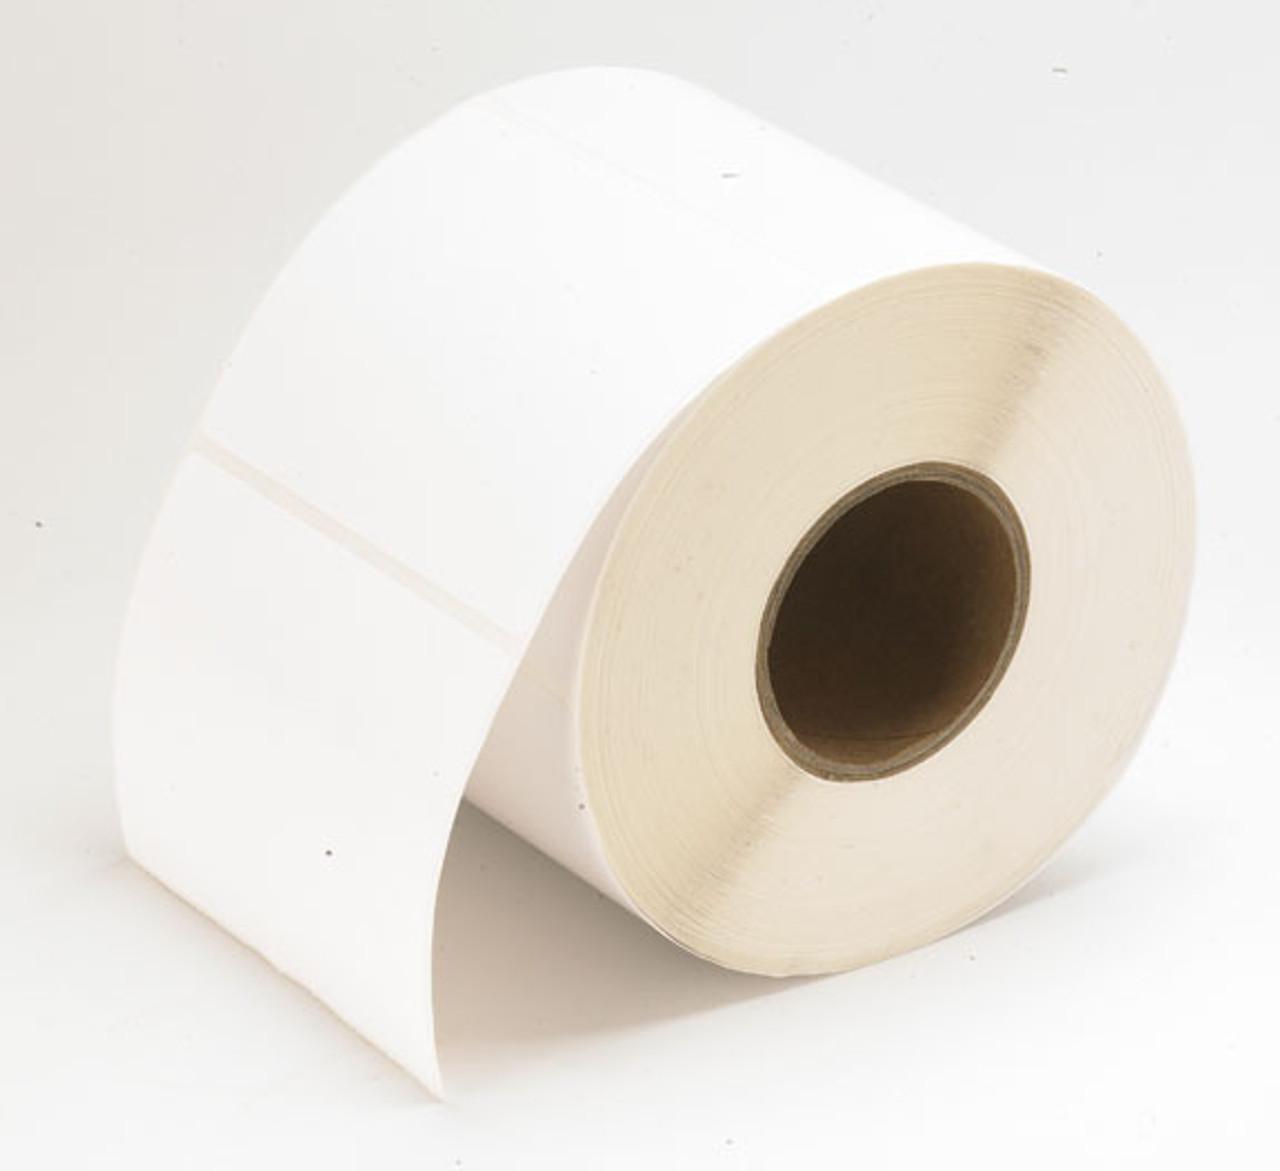 "Epson 2.5"" x 100 feet High Gloss Tag Rolls for TM-C3400 & TM-C3500"